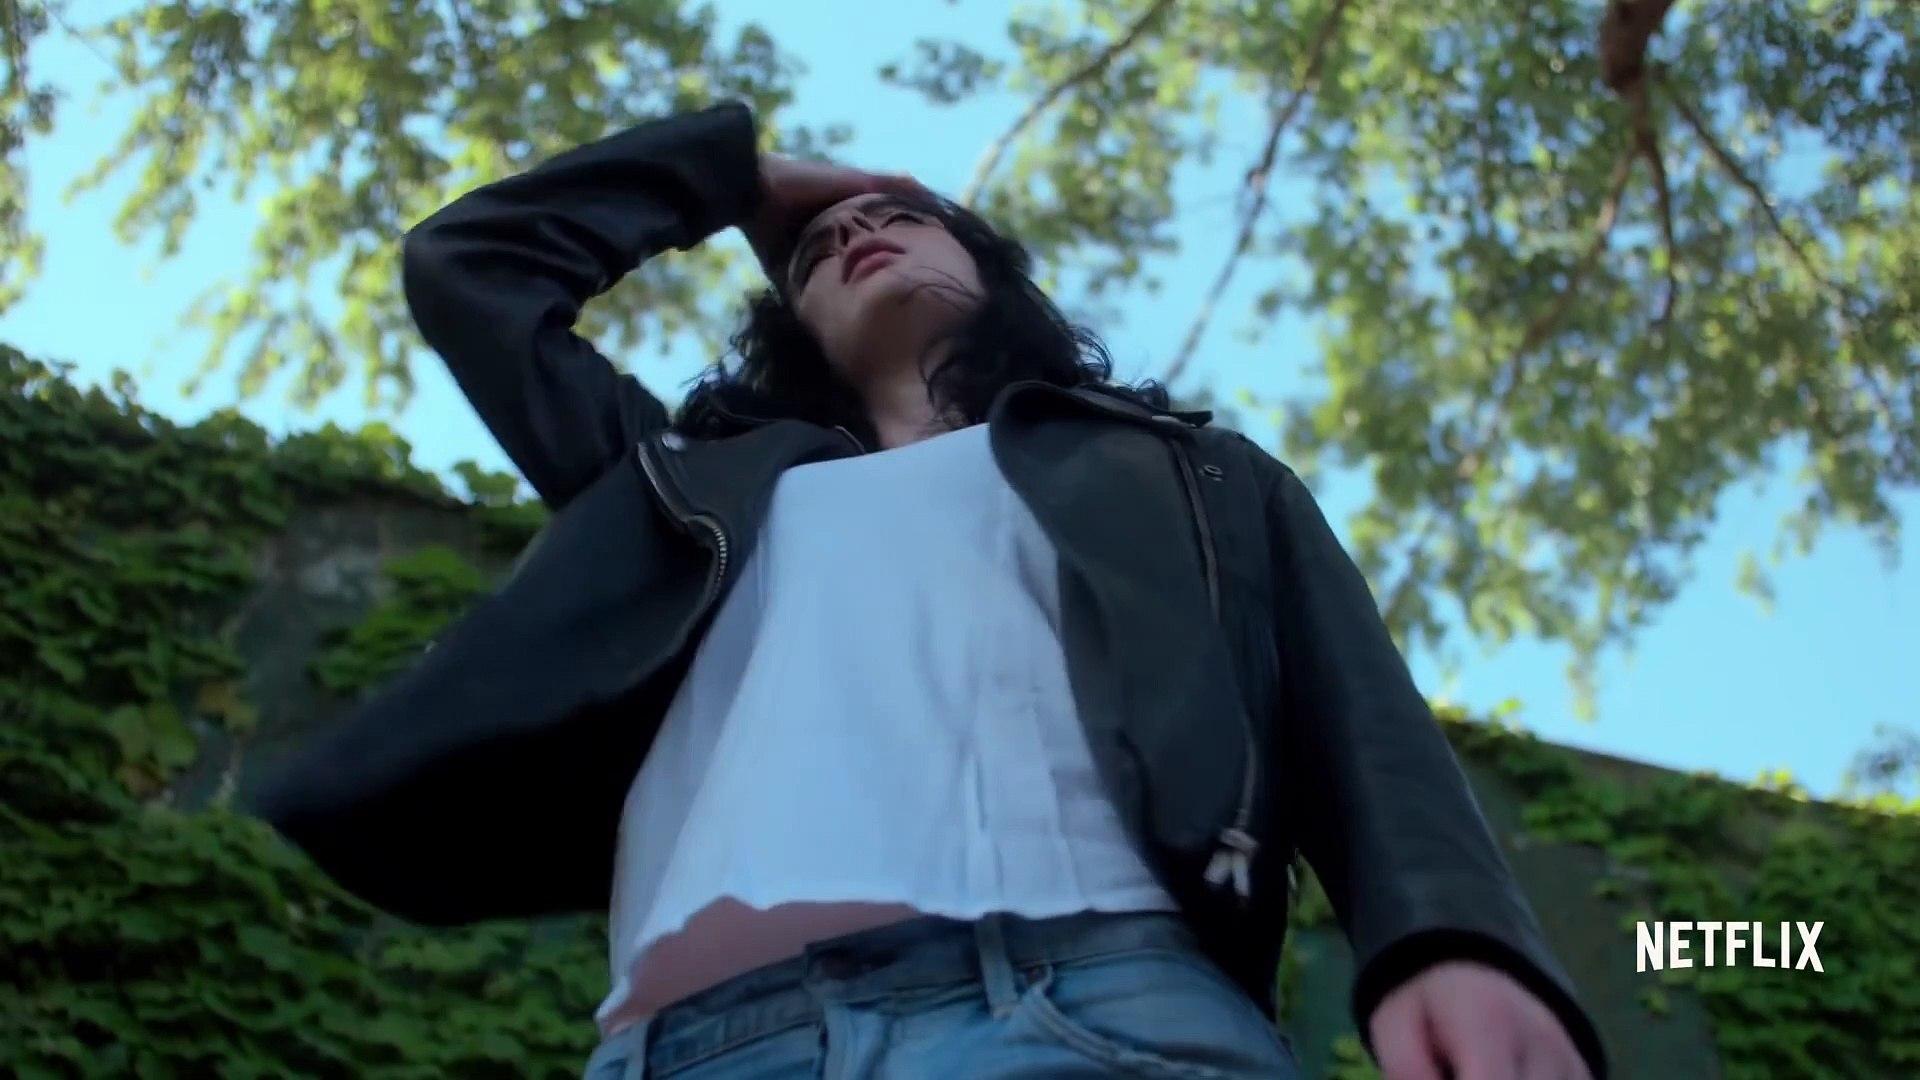 JESSICA JONES Season 2 - Jessica Jones returns March 8th 2018 only on NETFLIX